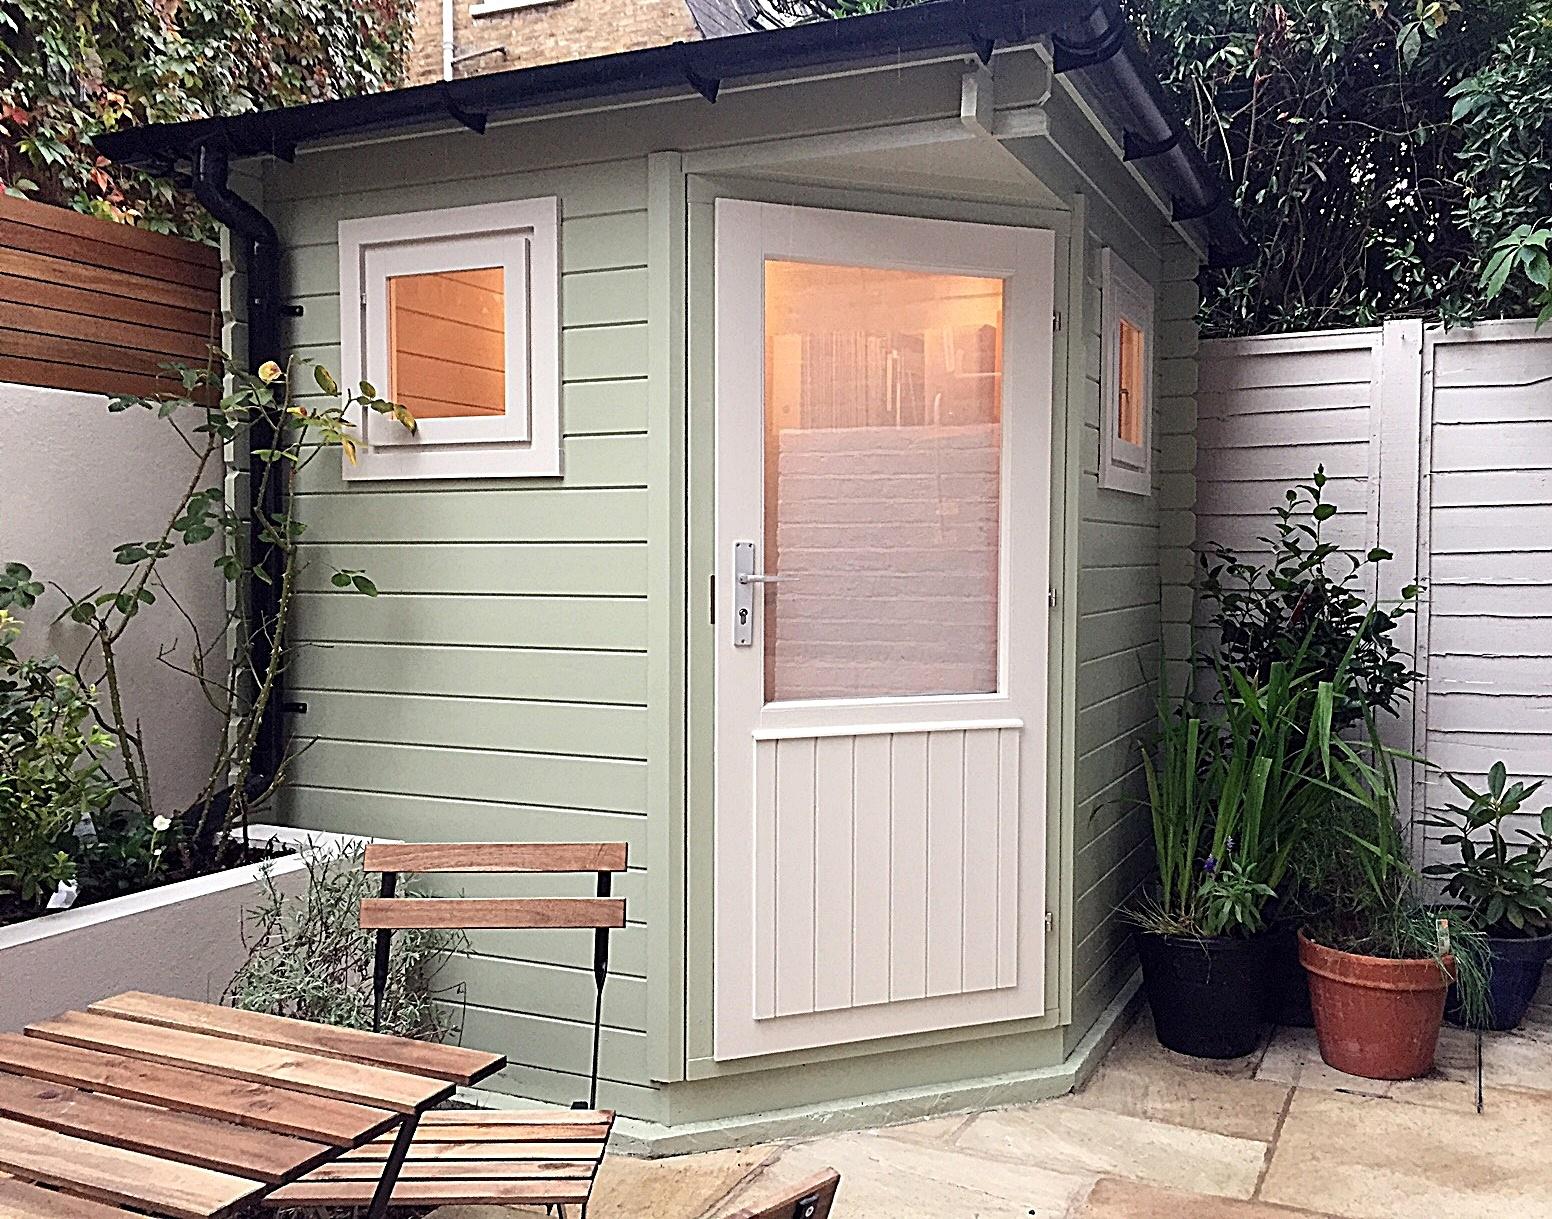 patio-paving-privacy-screen-raised-bed-planting-hardwood-trellis-fencing-london-fulham-kensington-mayfair